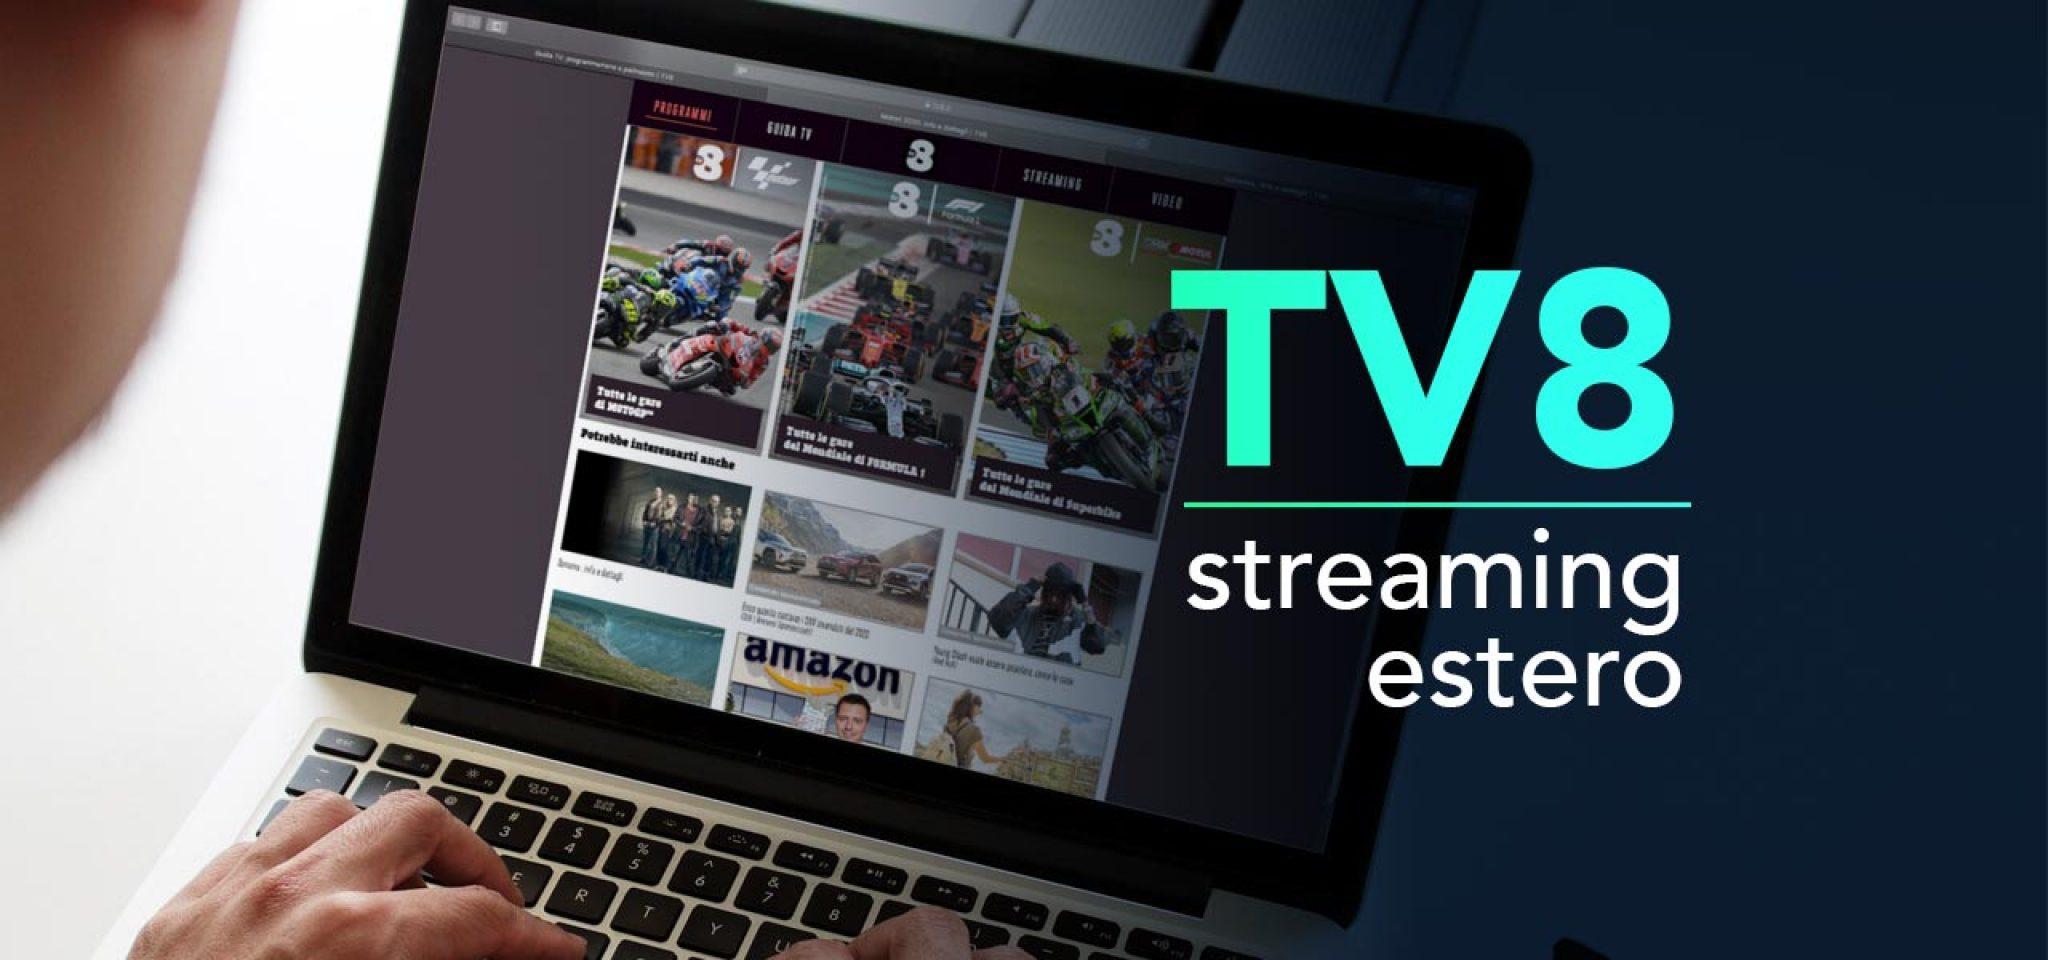 Tv8 Streaming